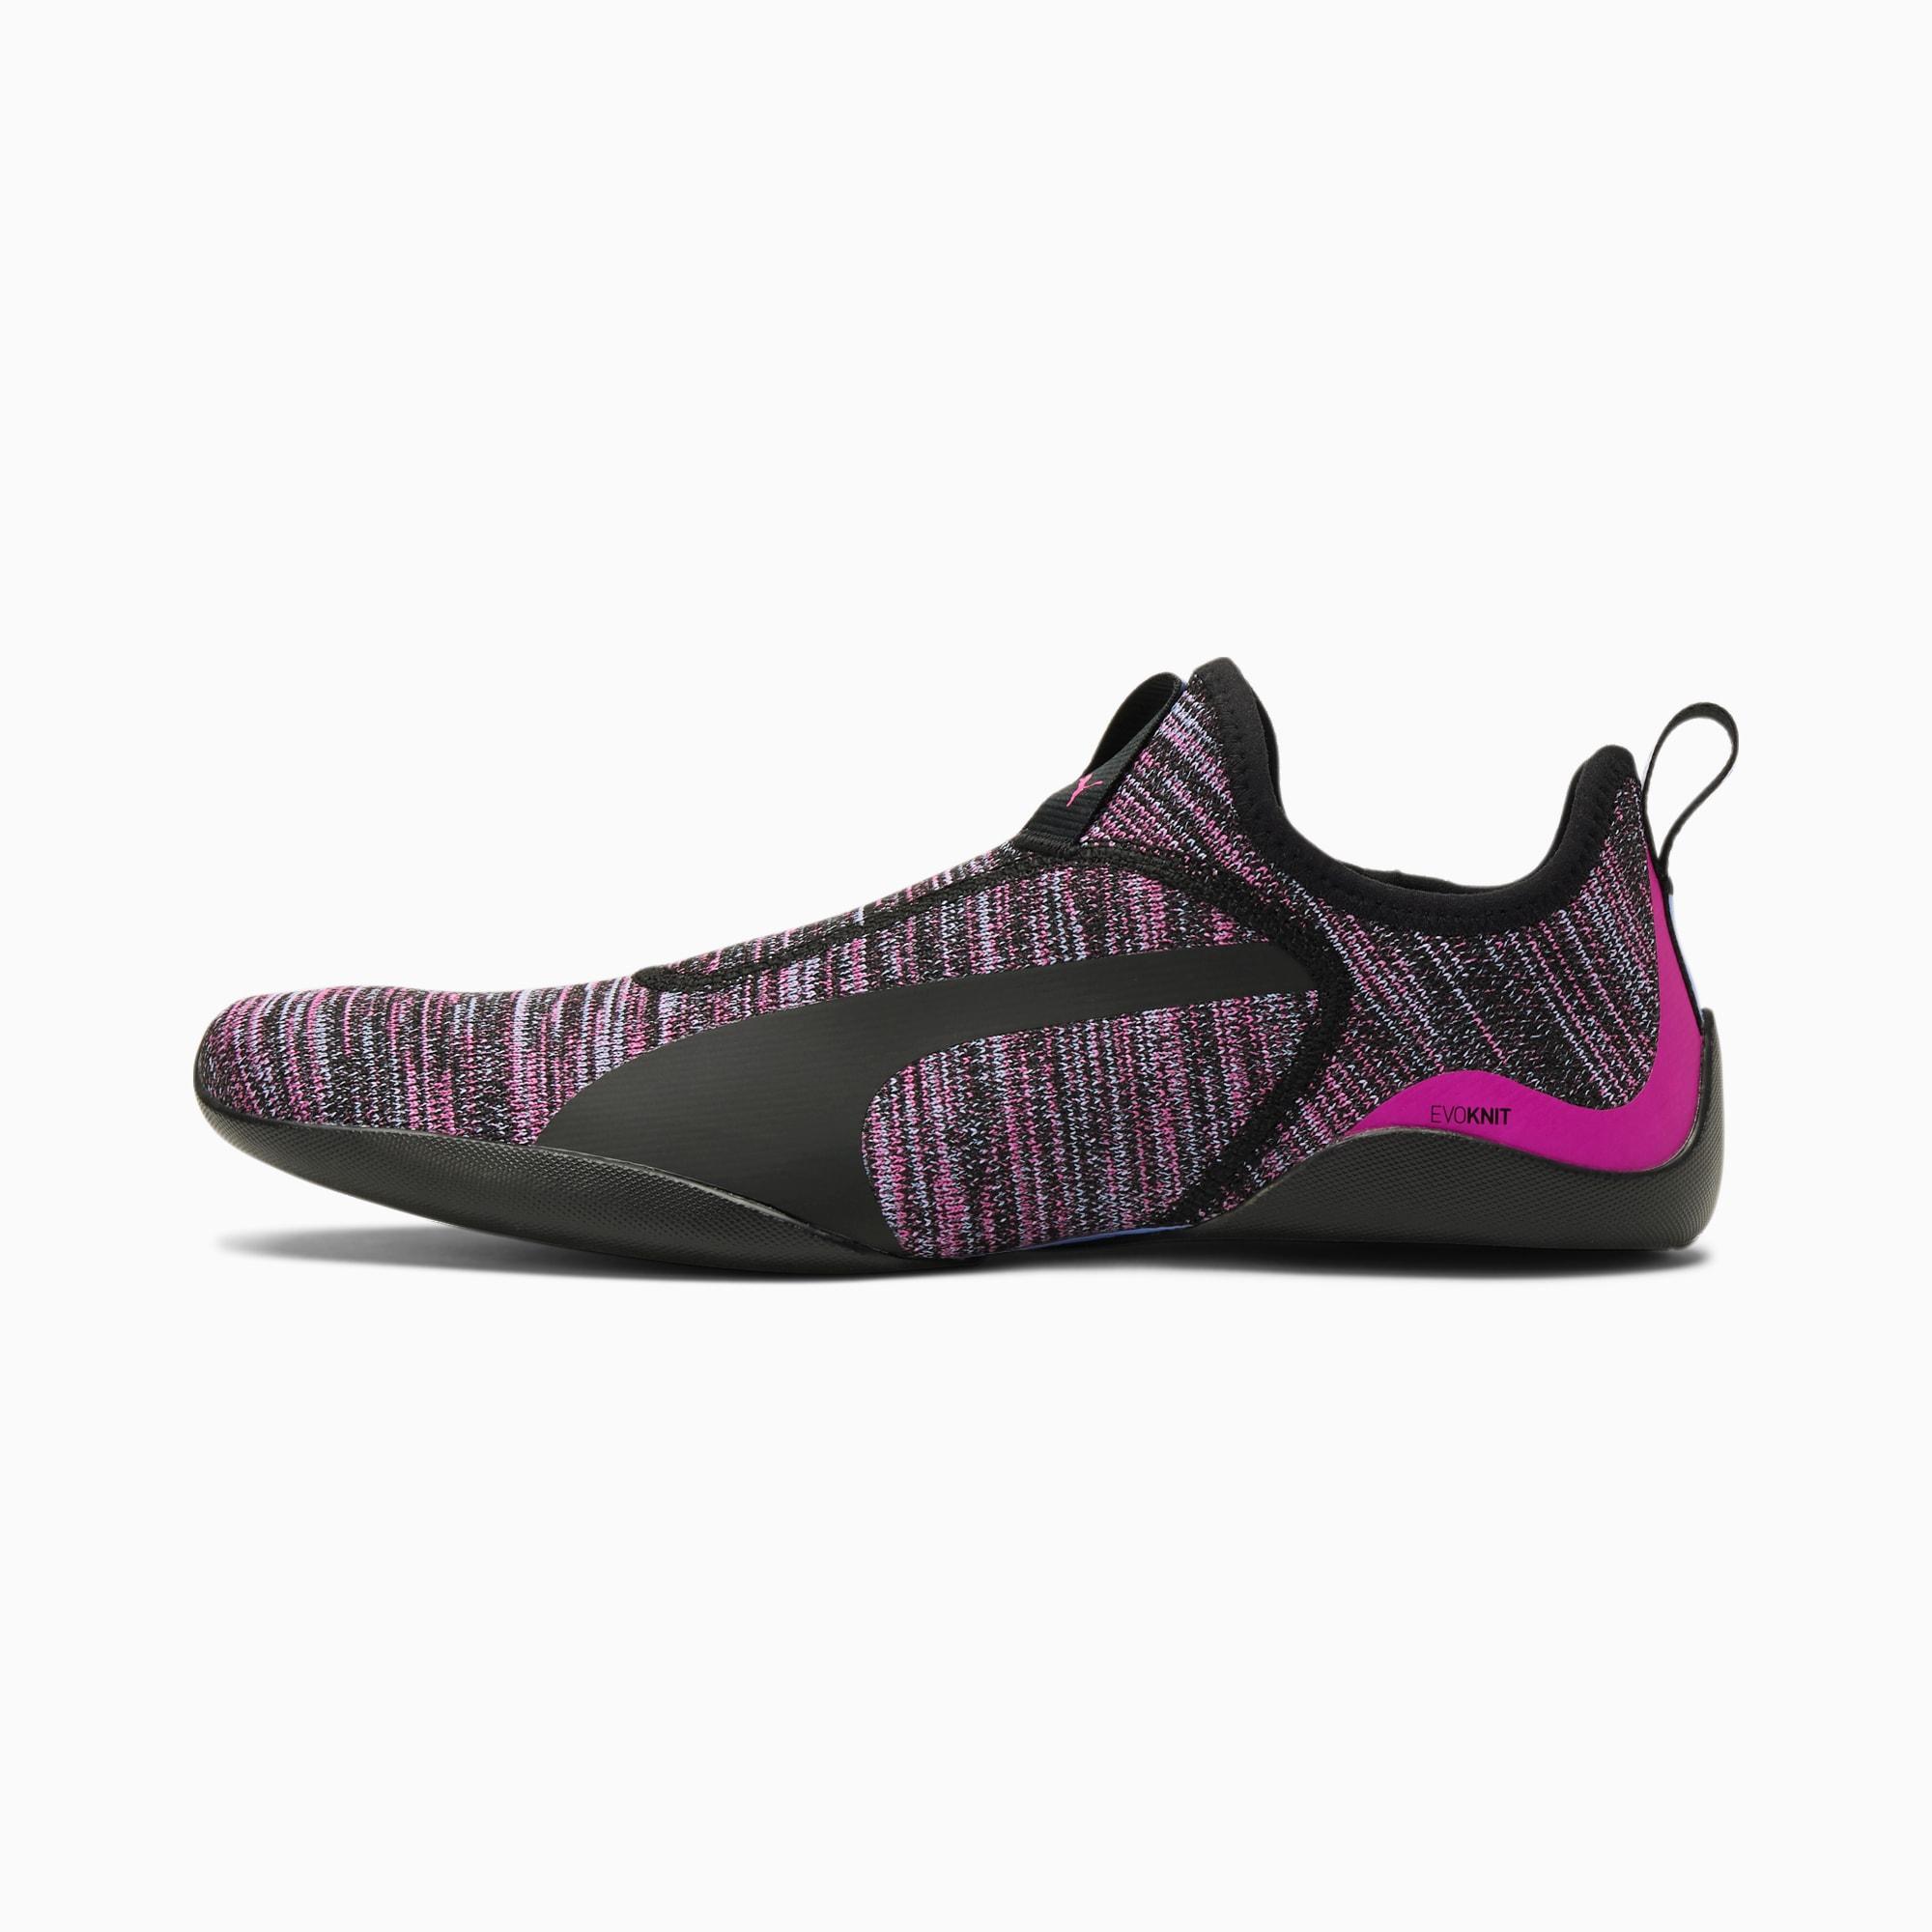 AGF EVOKNIT Esports Sneakers